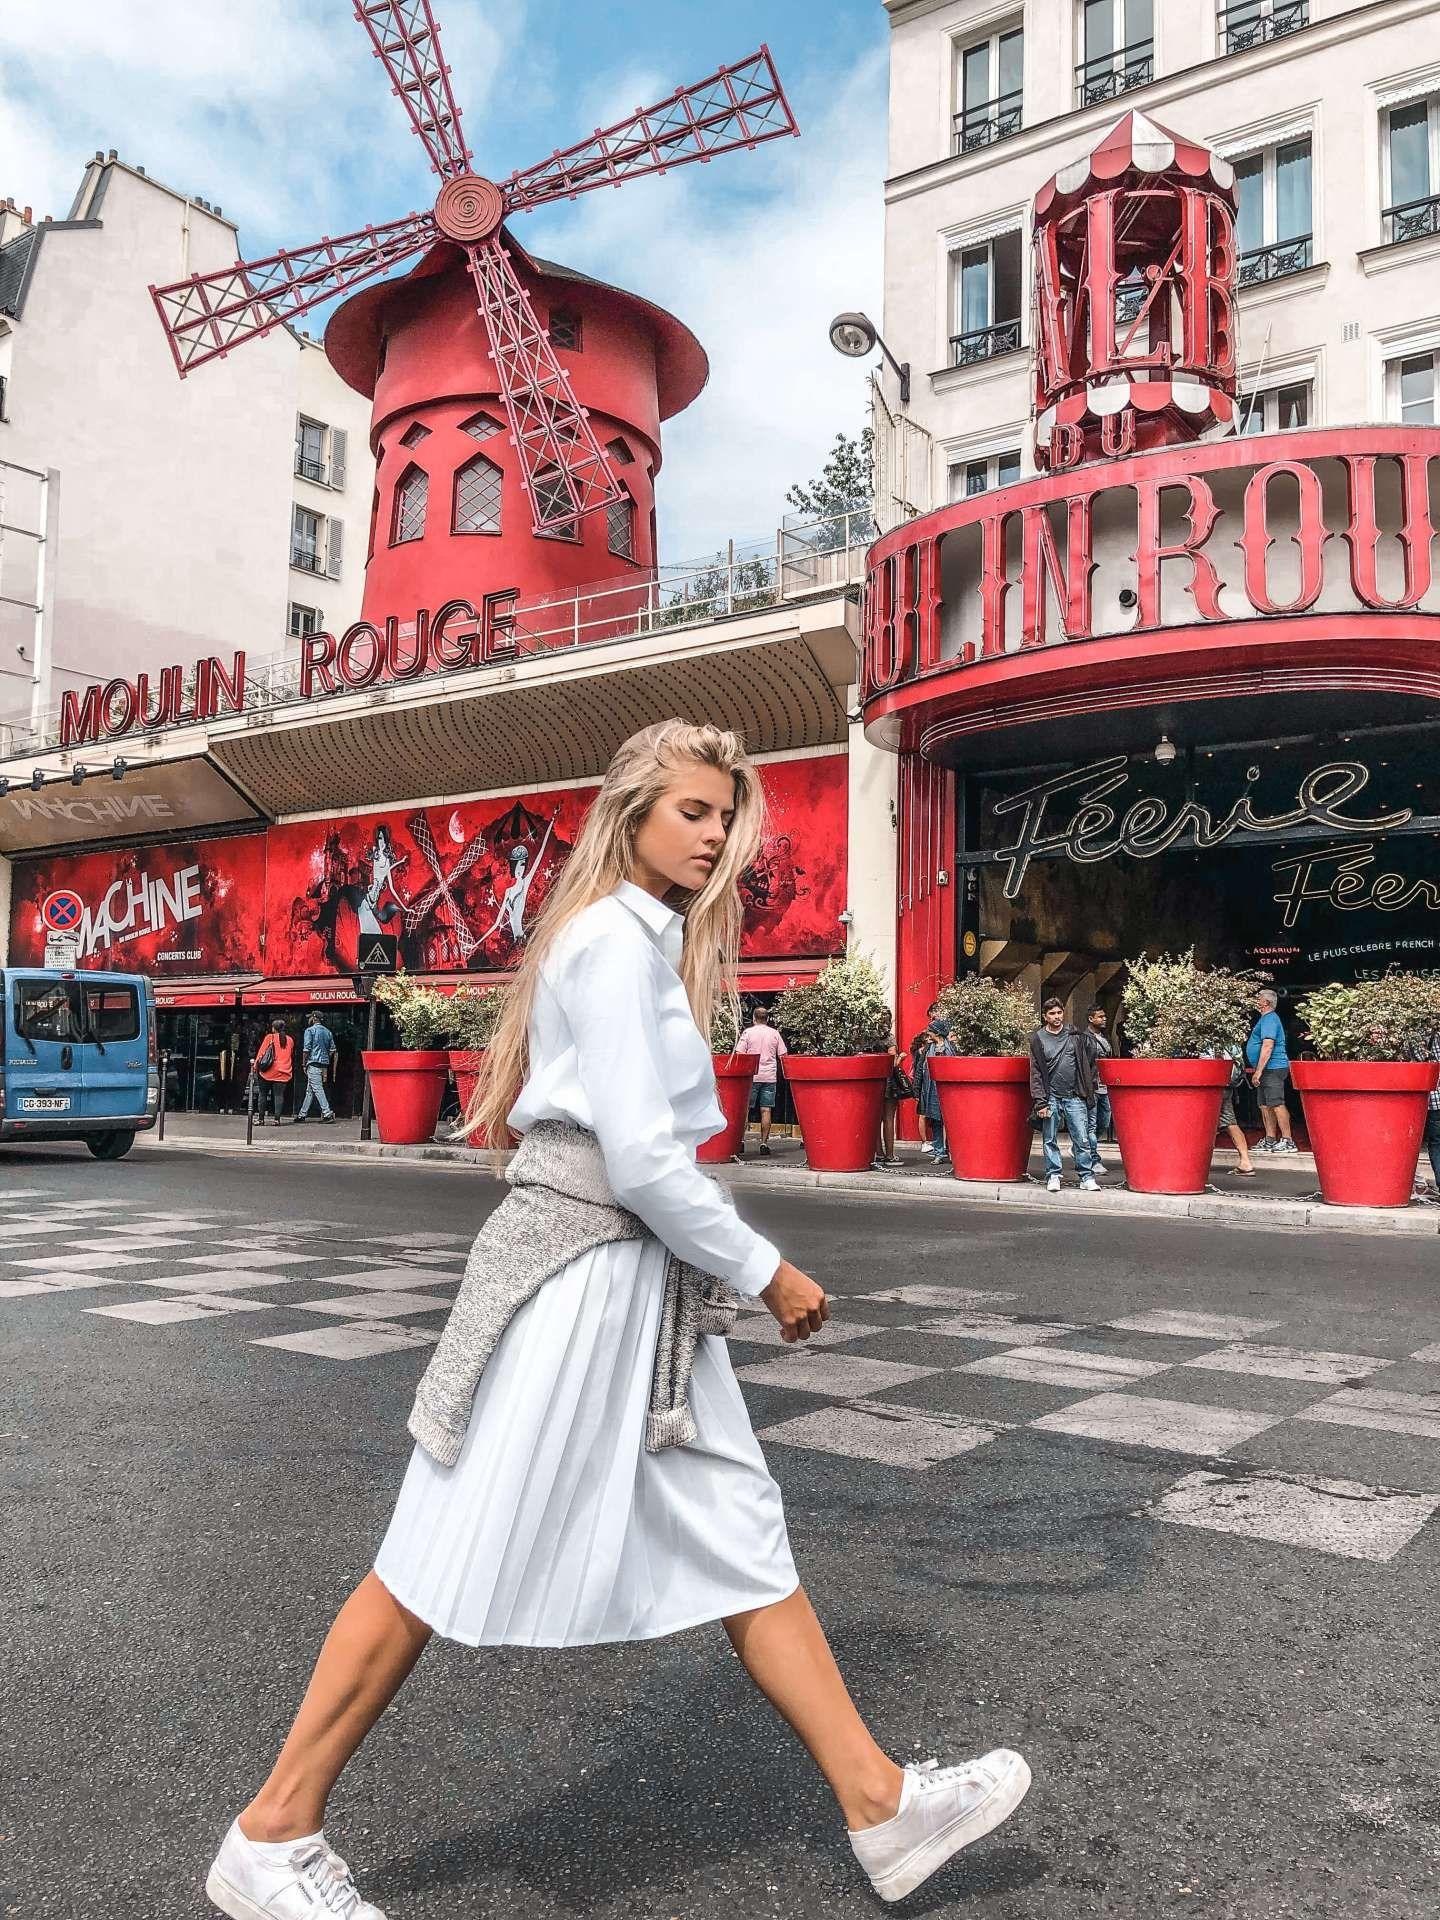 Die 10 schönsten Fotolocations in Paris